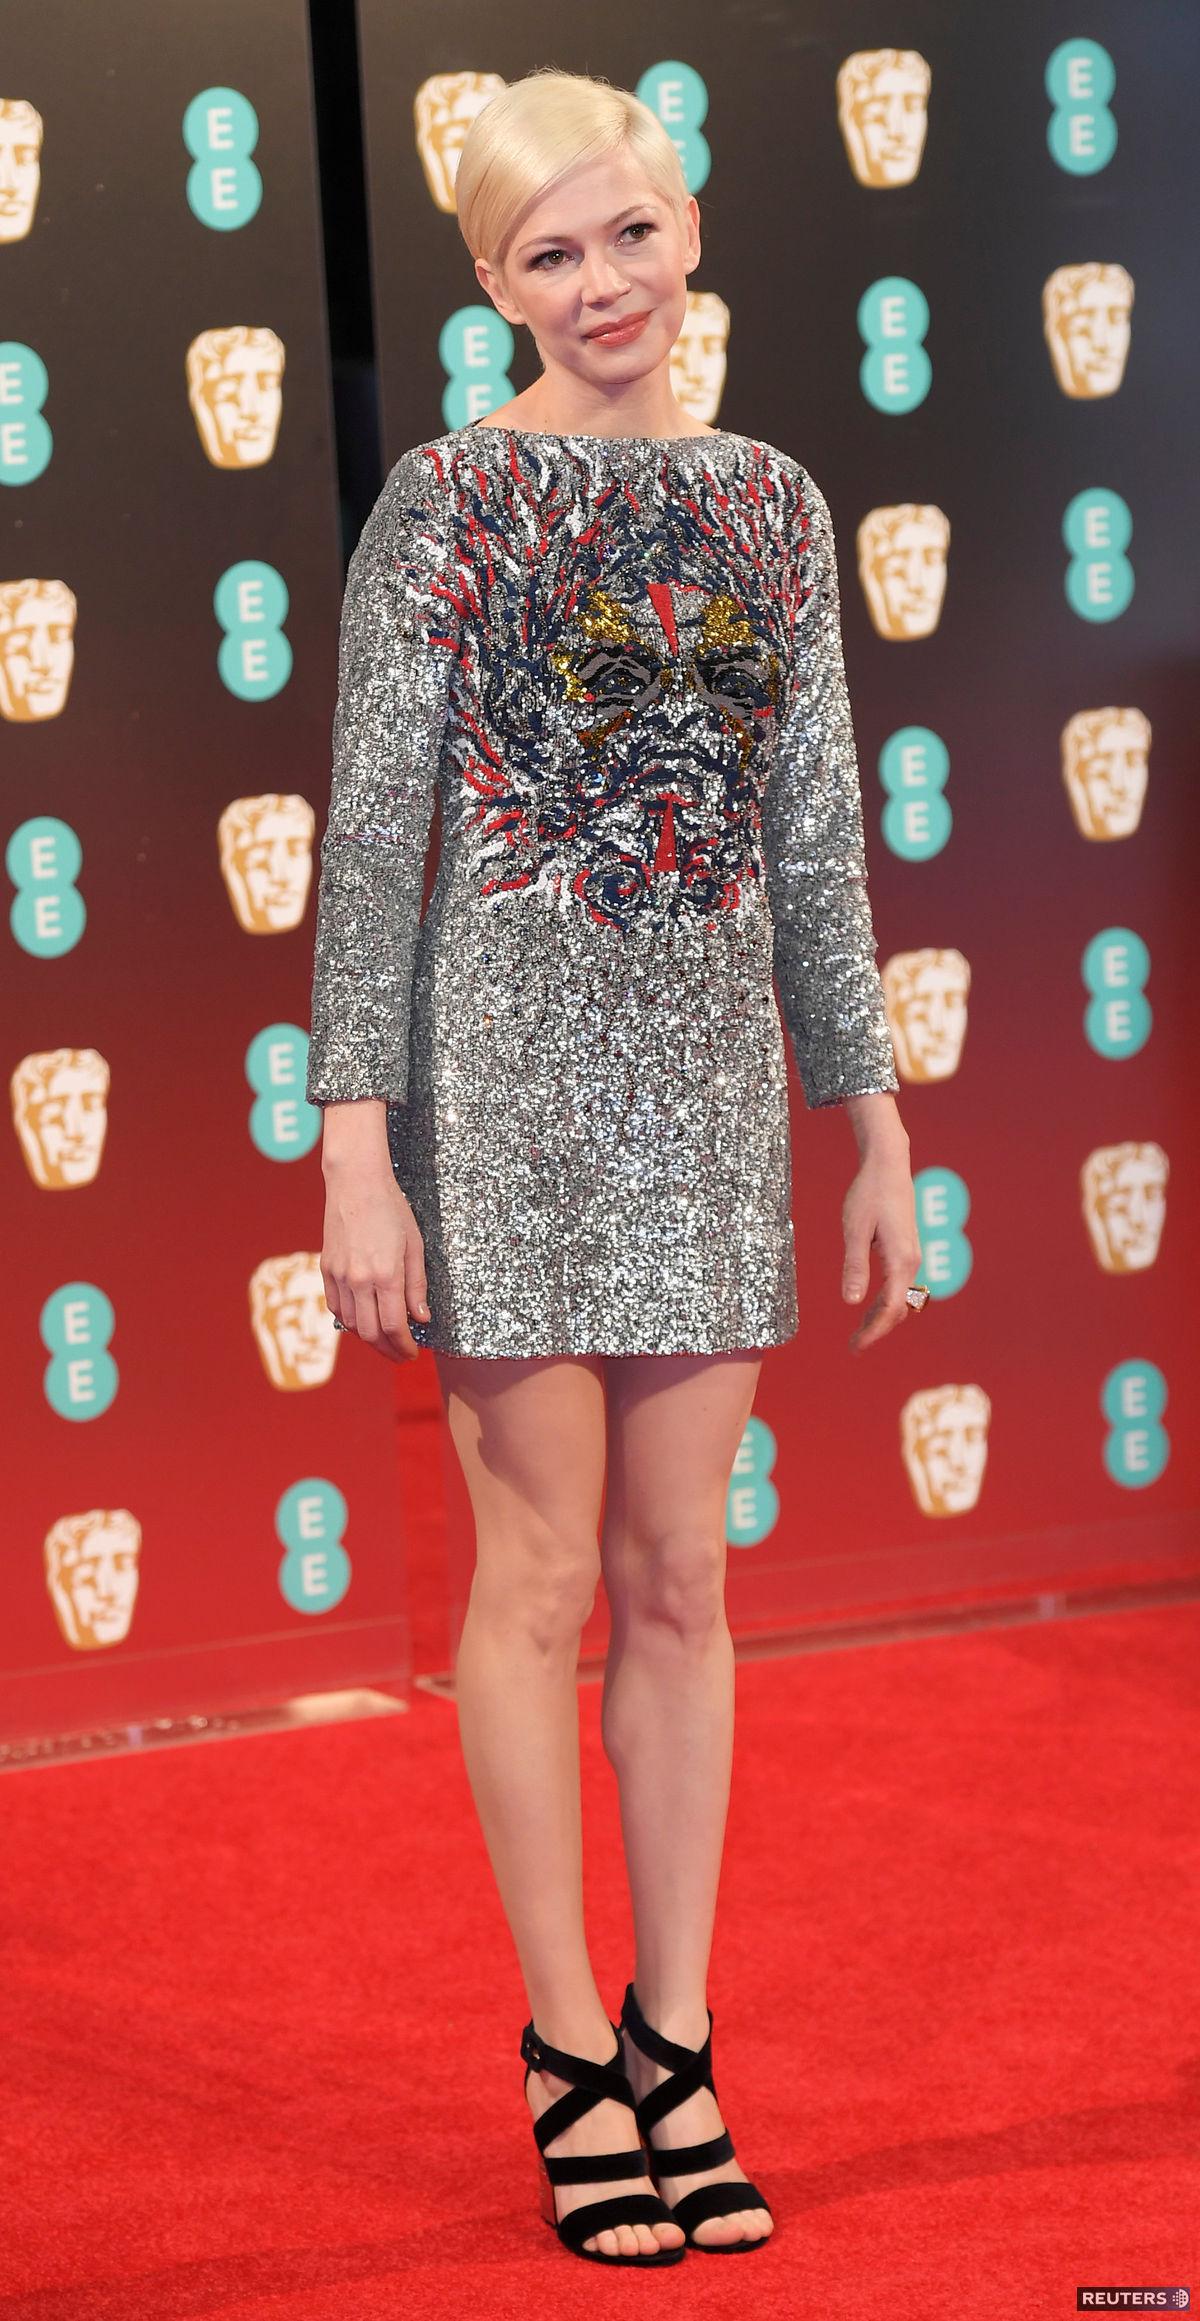 Herečka Michelle Williams prišla v šatách Louis Vuitton.